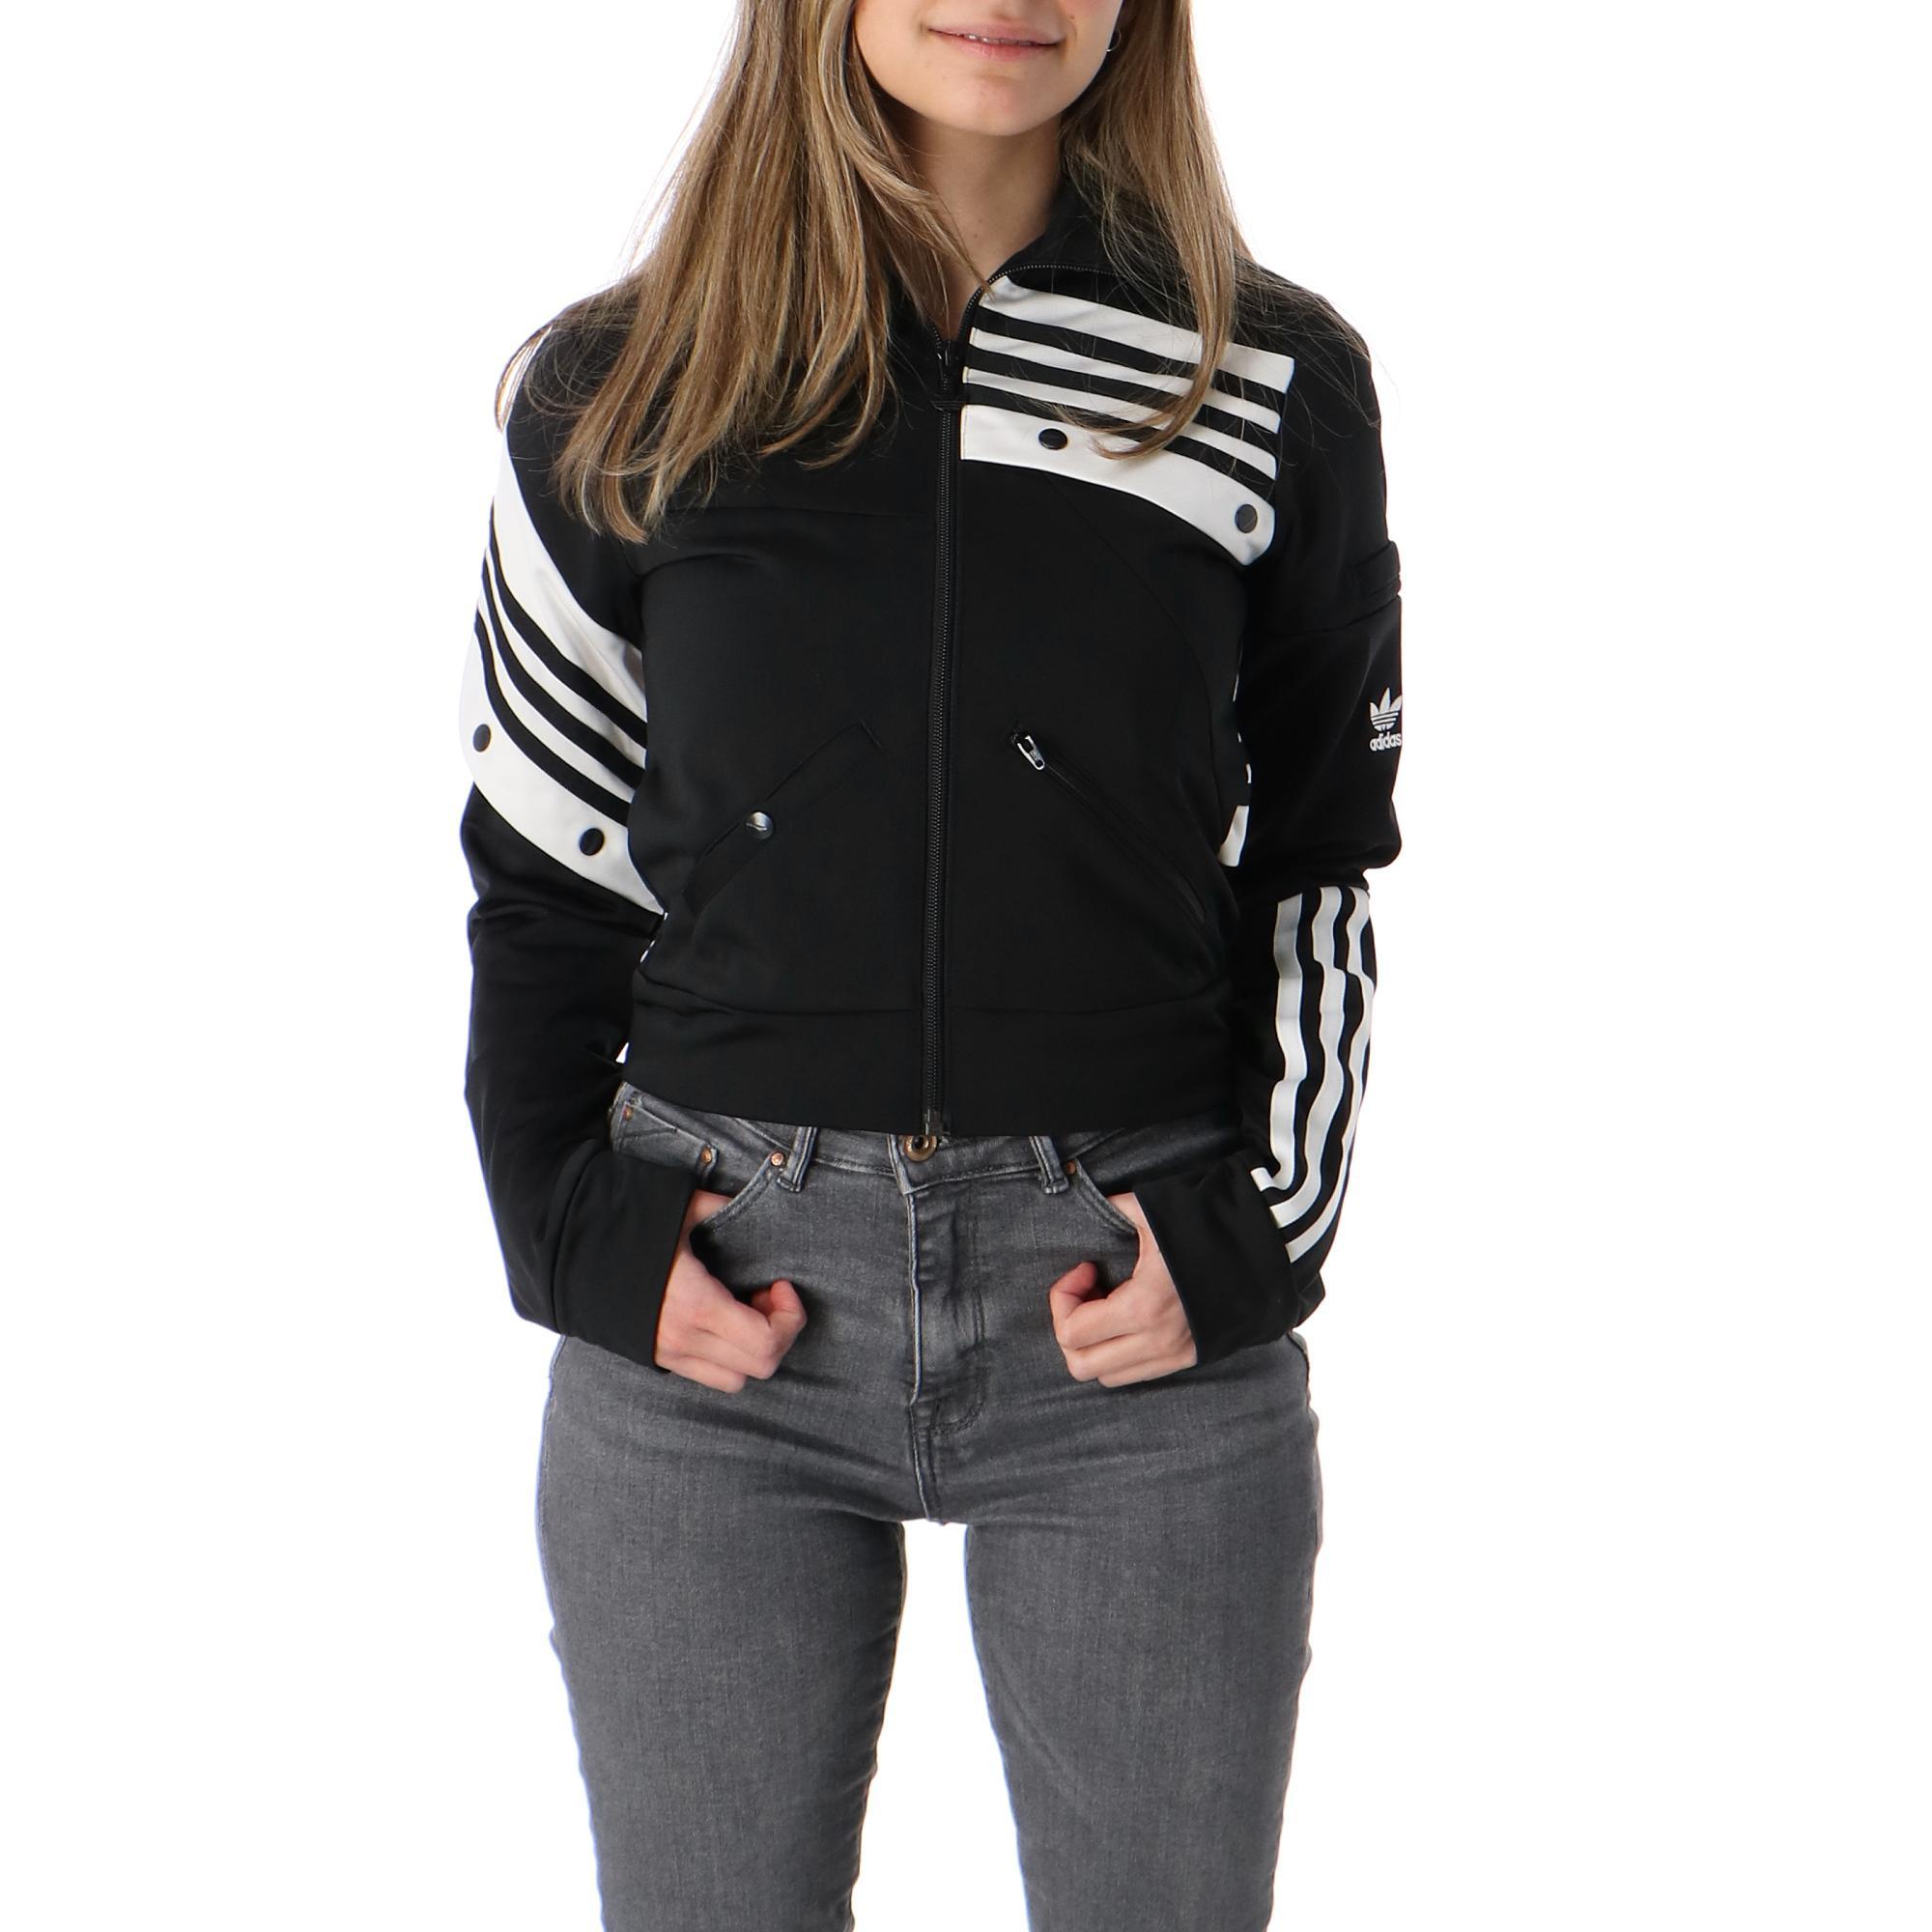 Adidas D. Cathari Tt Black